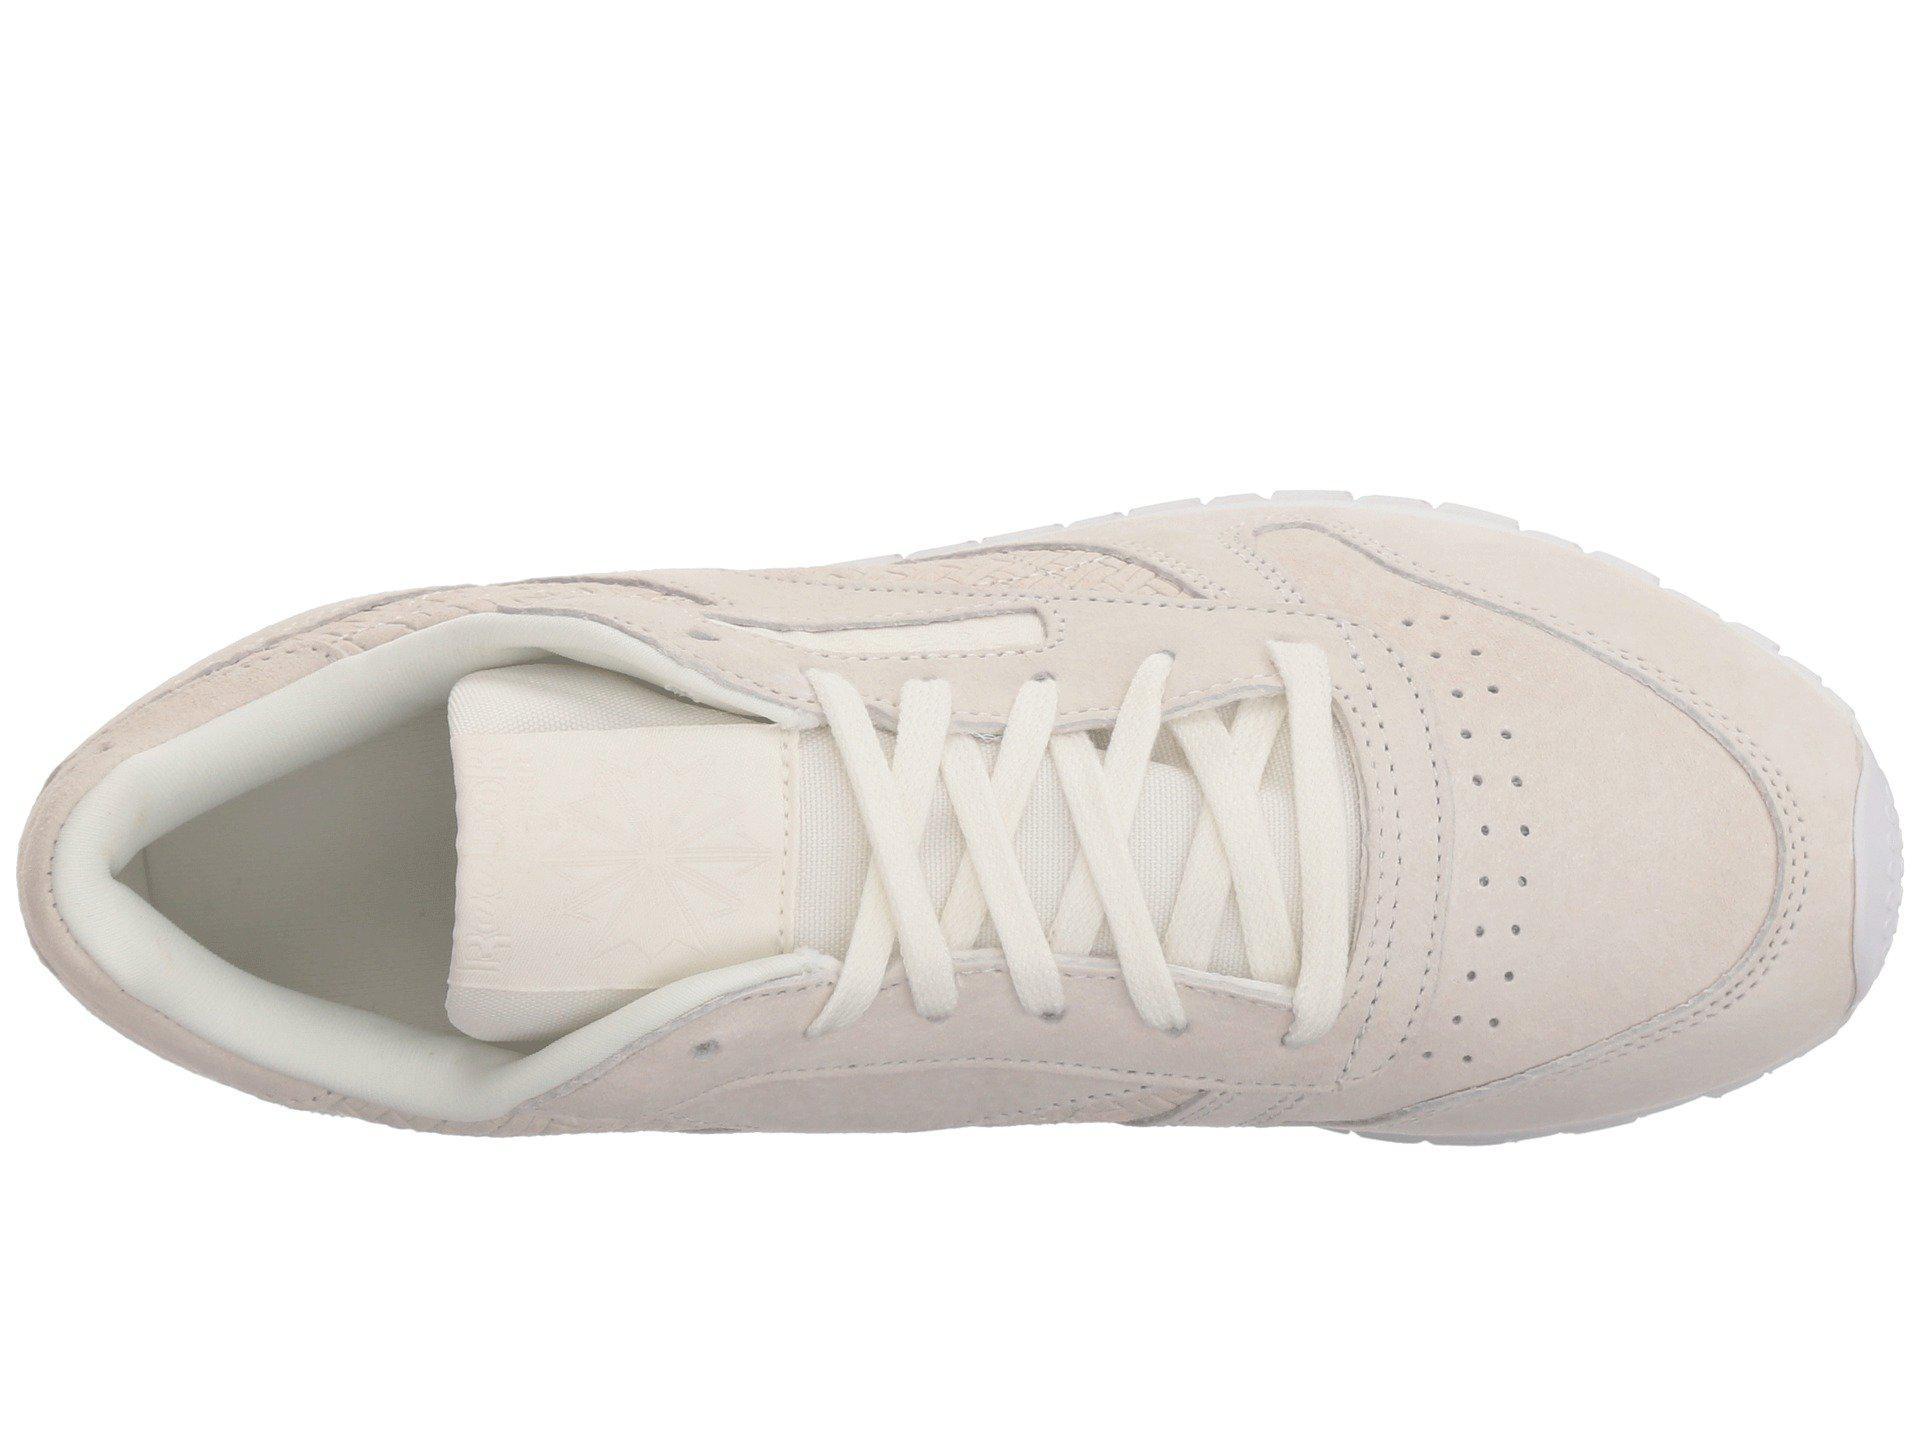 8b6b66a6c3c Reebok - Classic Leather Woven Embossed (chalk white) Women s Classic Shoes  - Lyst. View fullscreen